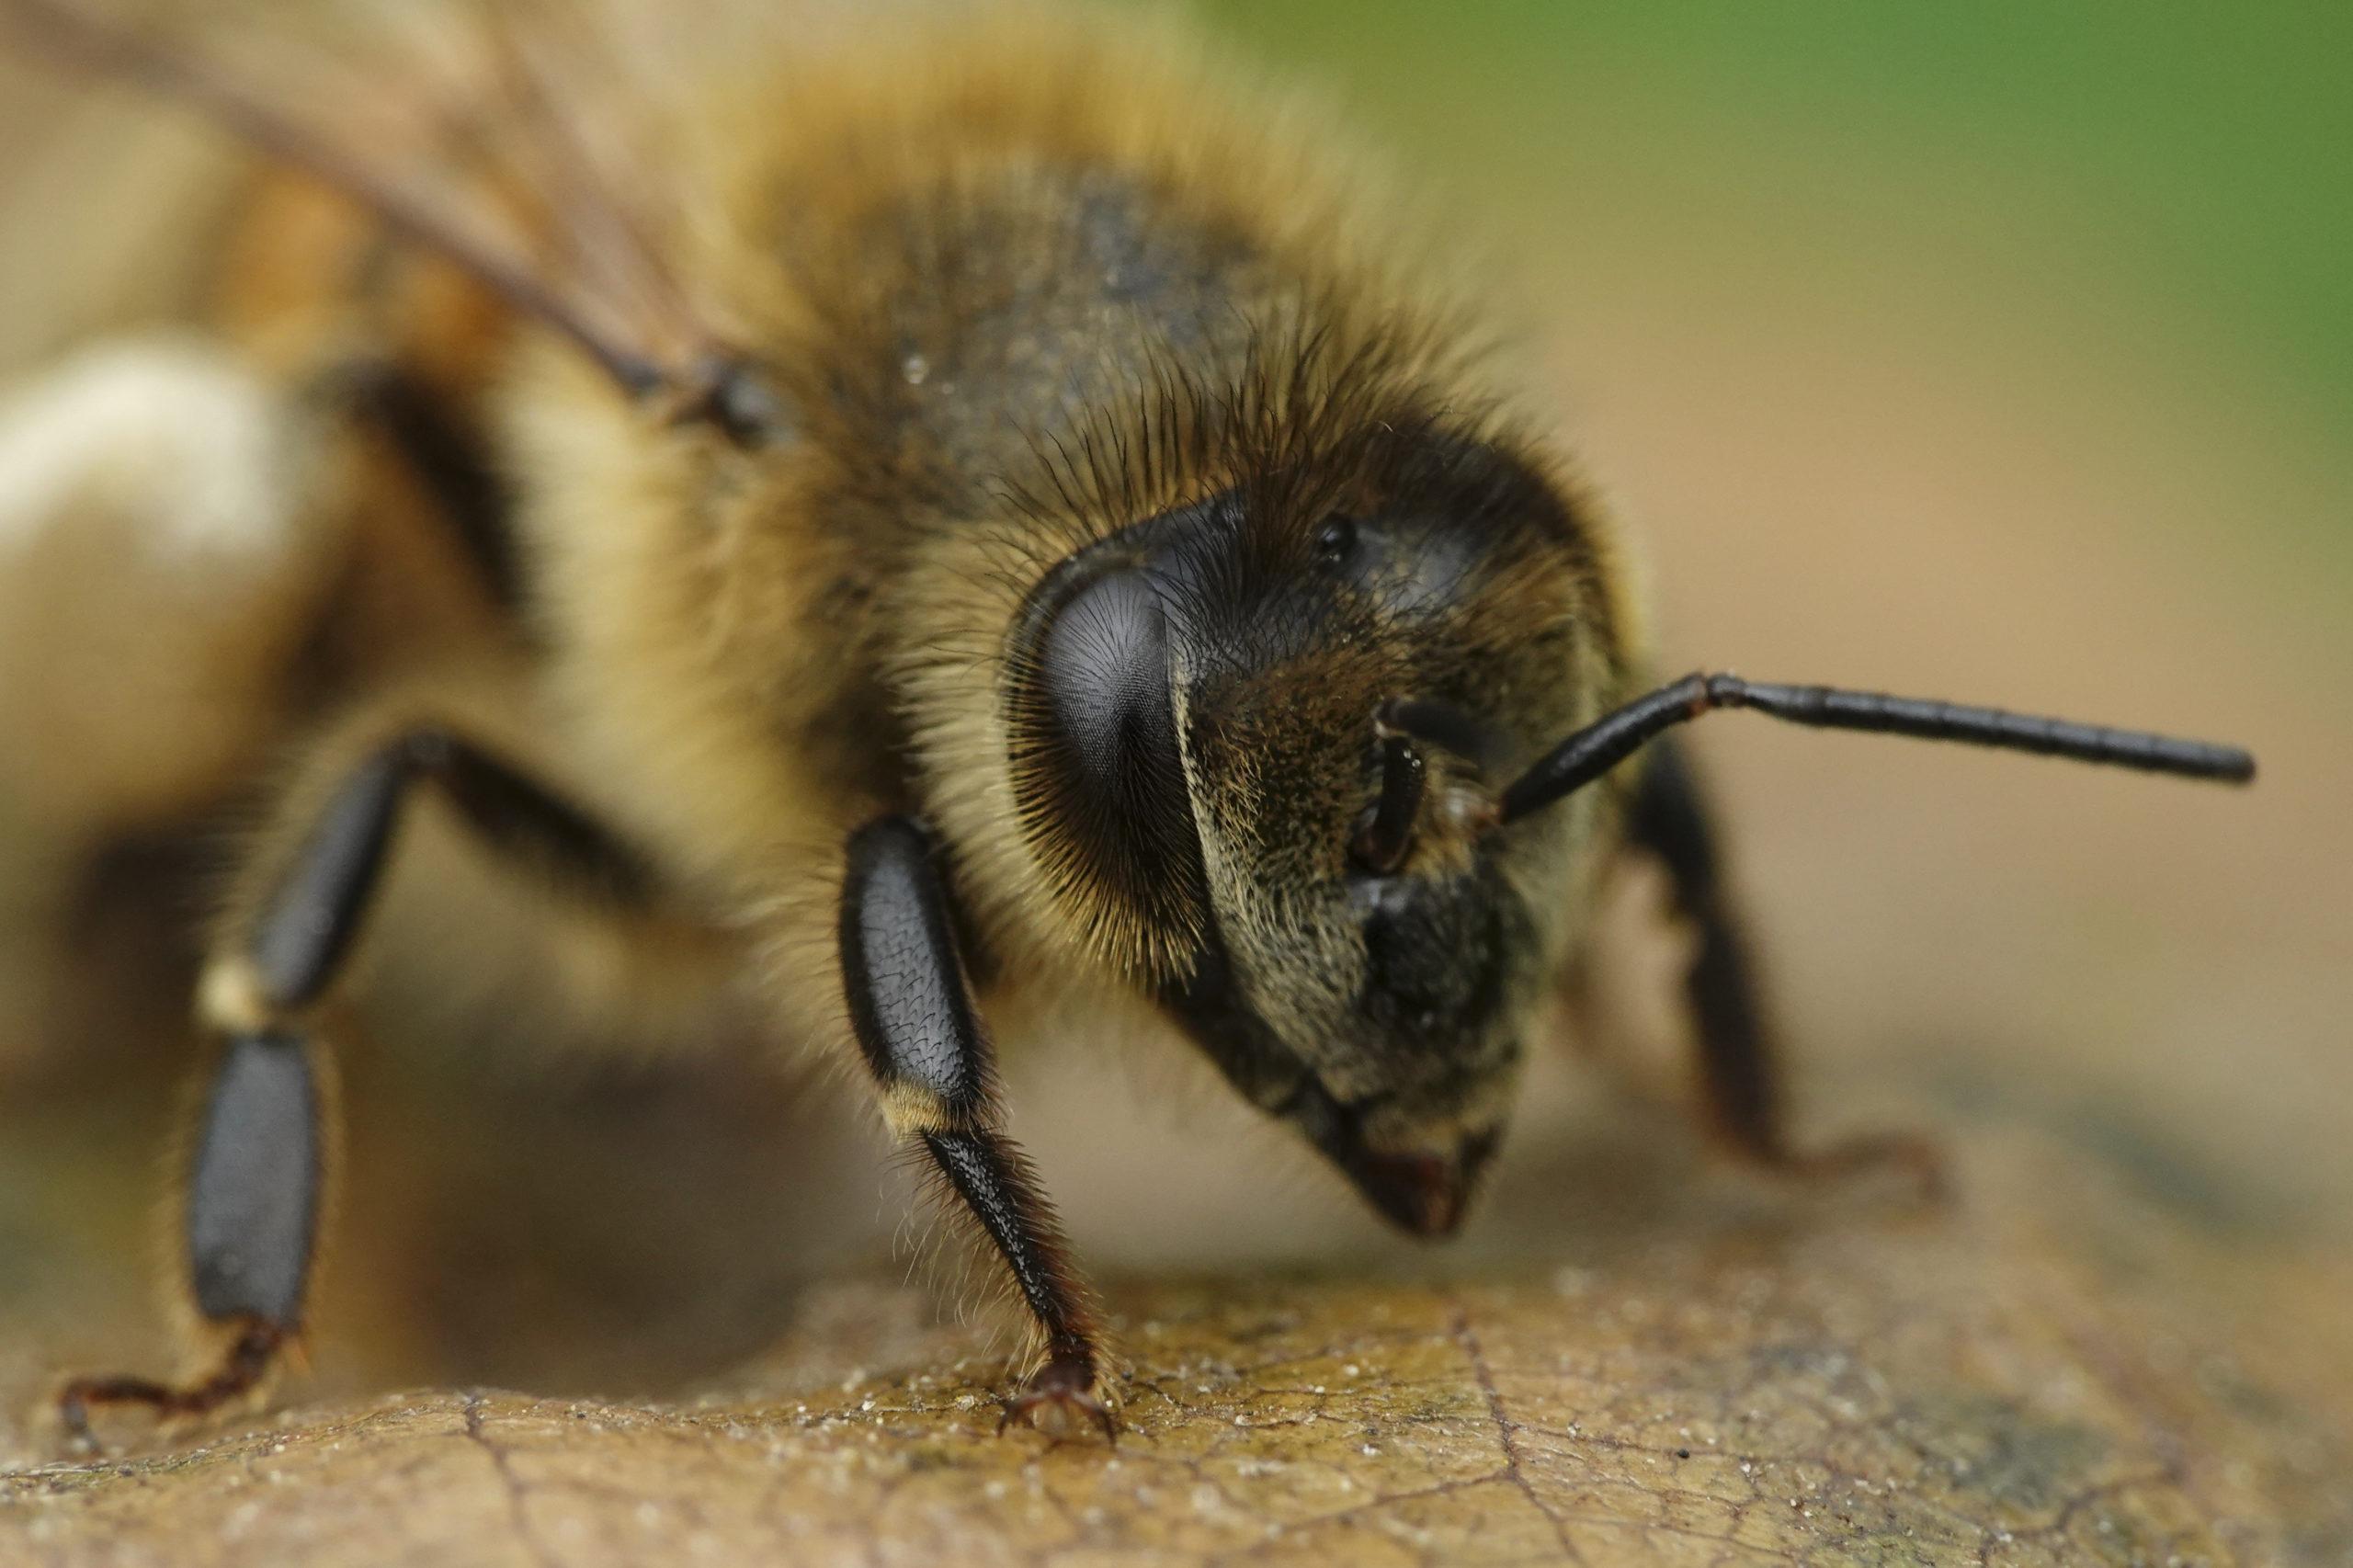 Image of a European honey bee